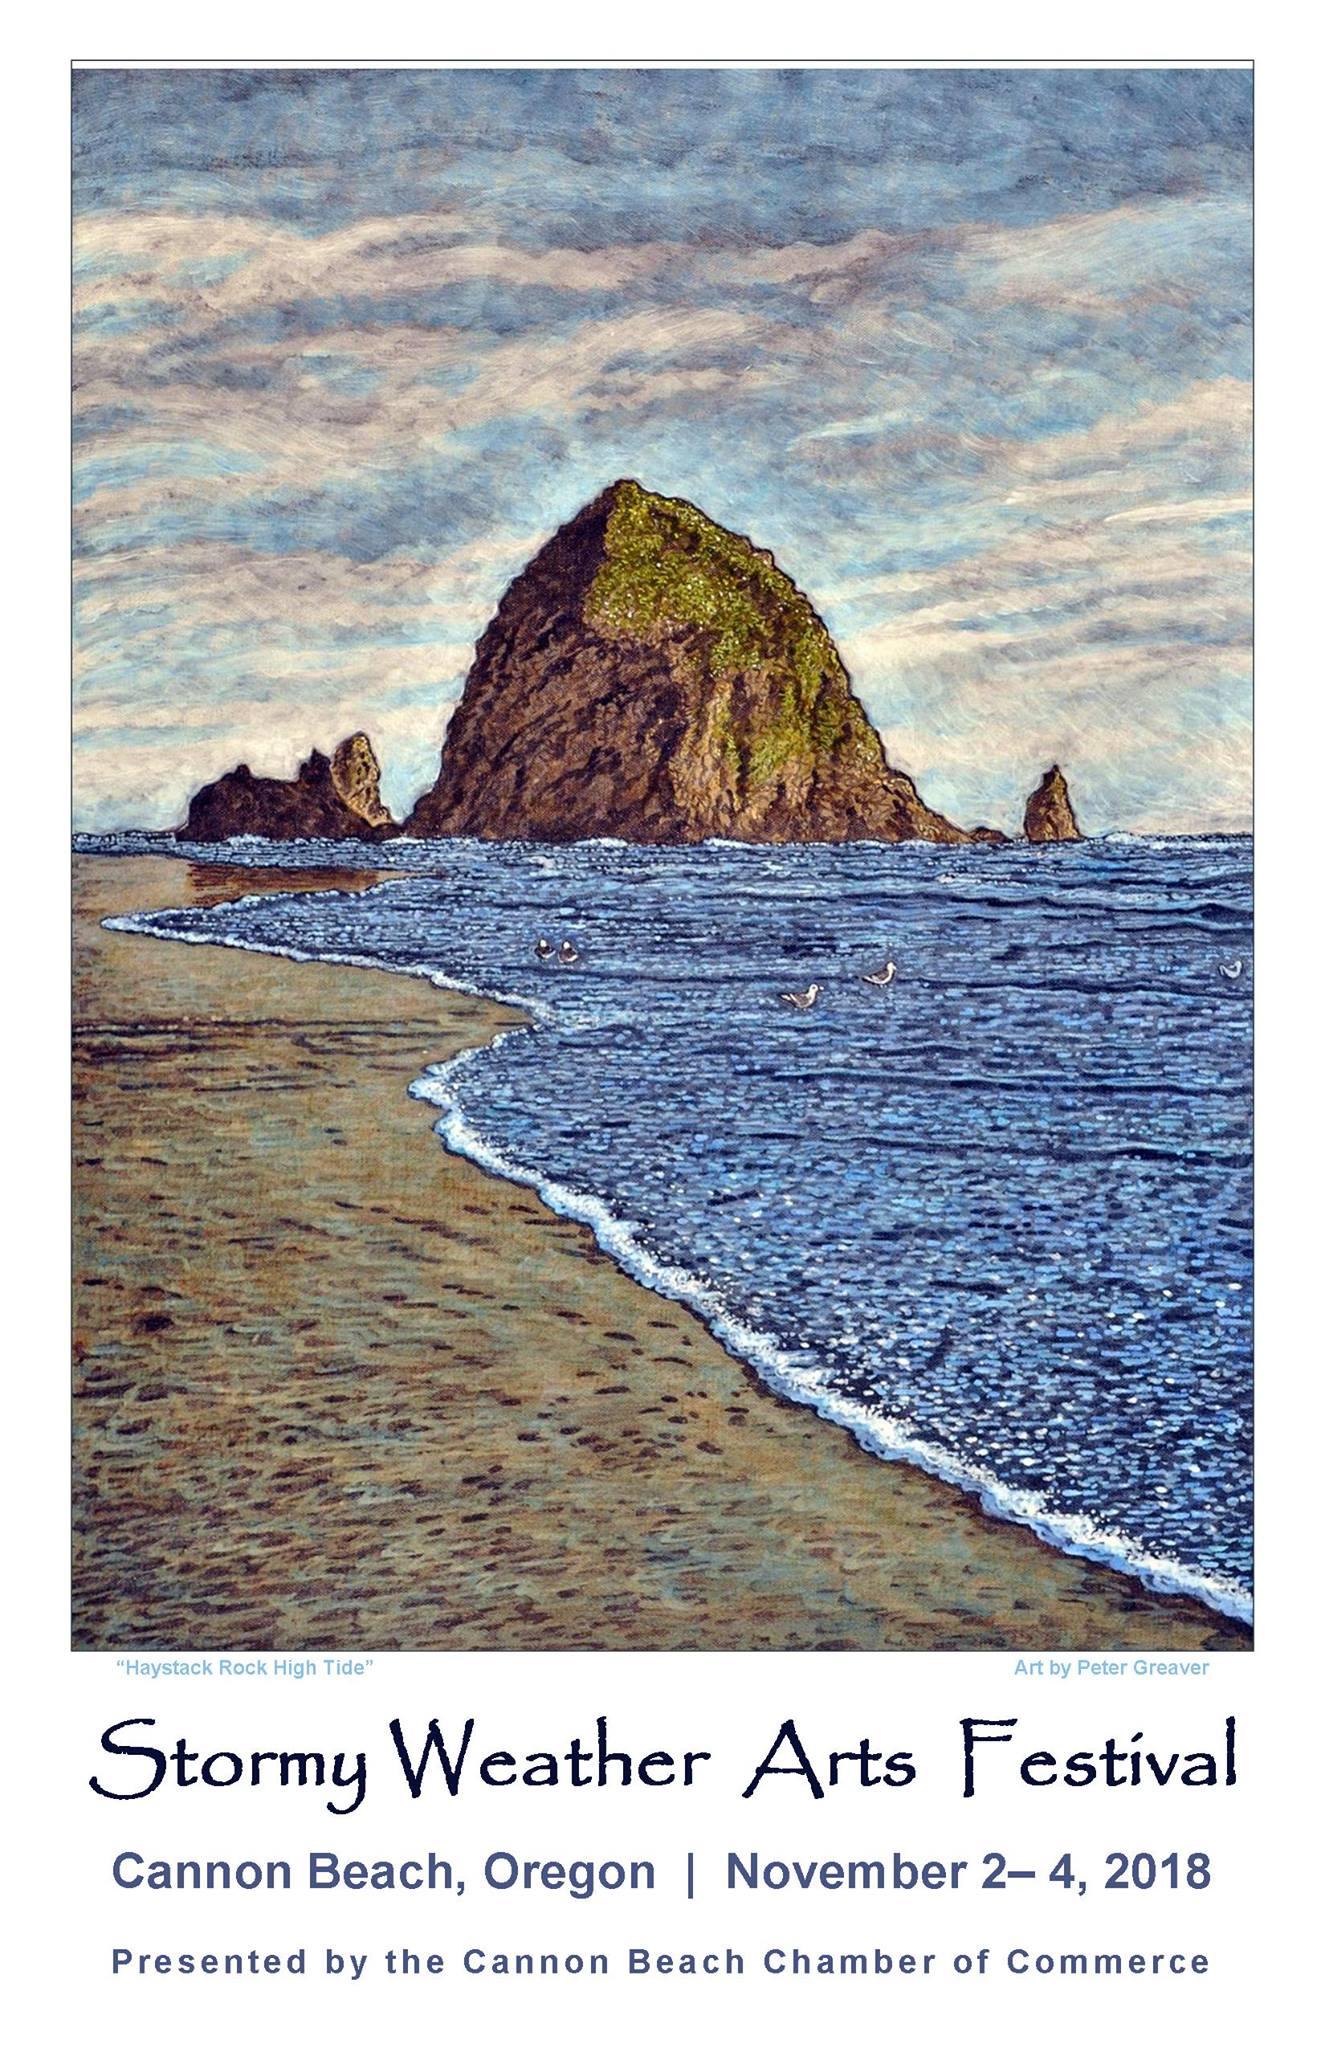 Oregon Blues Greats Headline Cannon Beach Stormy Weather Art Festival